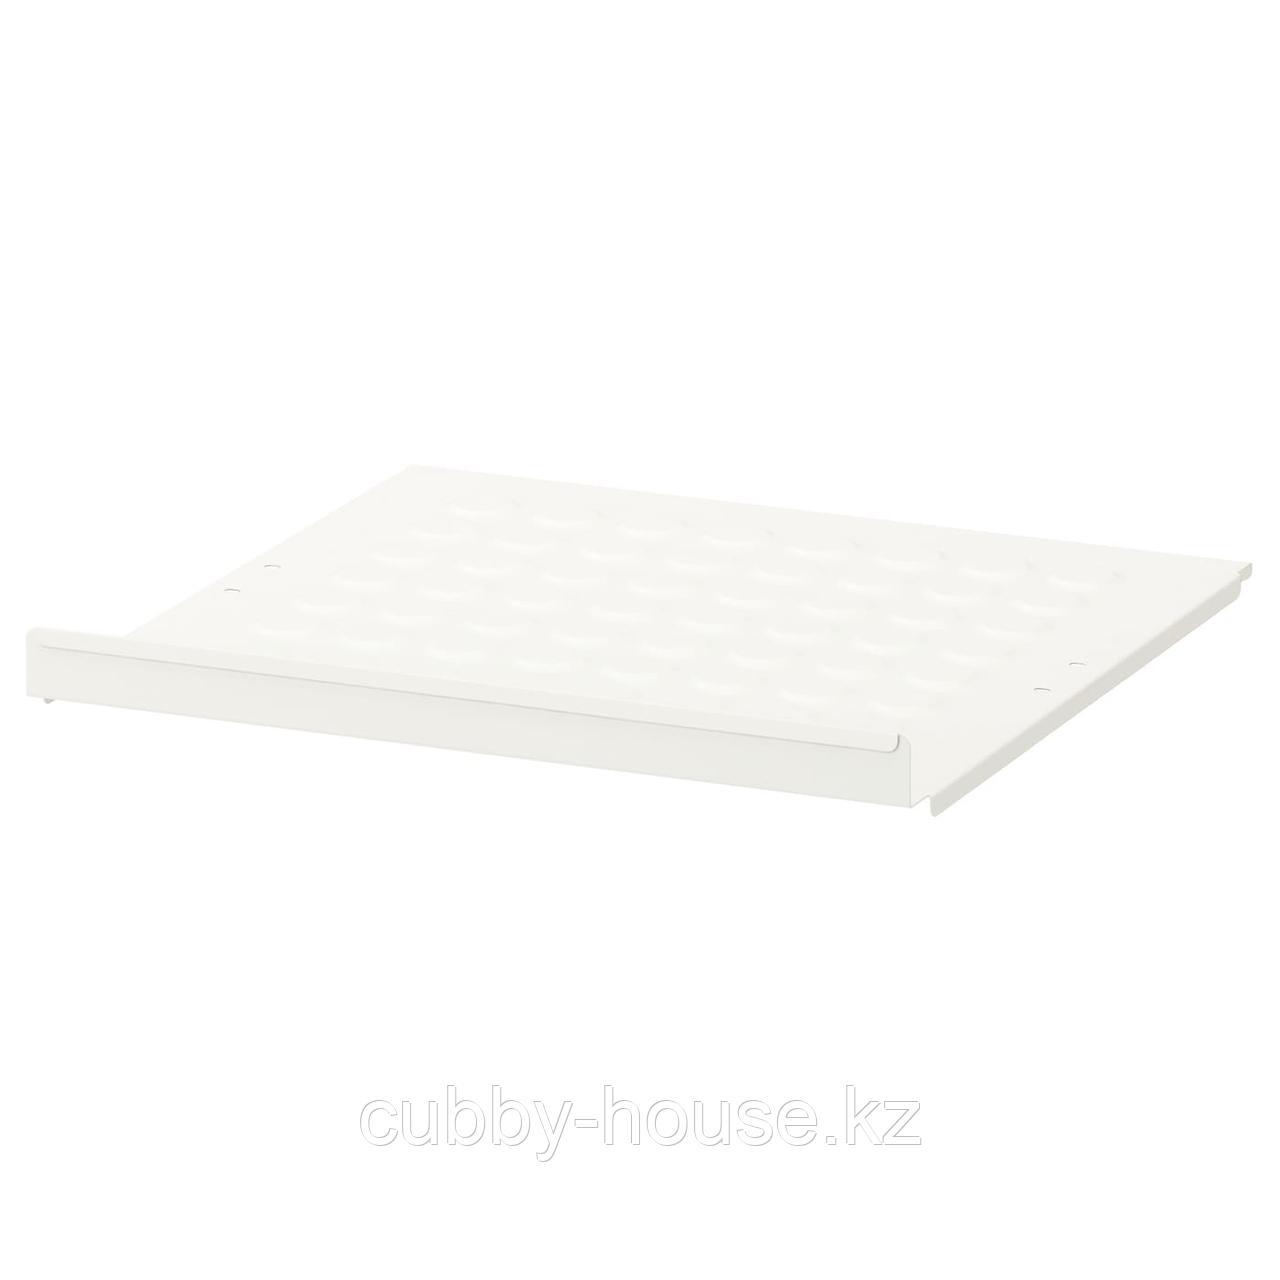 ЭЛВАРЛИ Полка для обуви, белый, 80x36 см